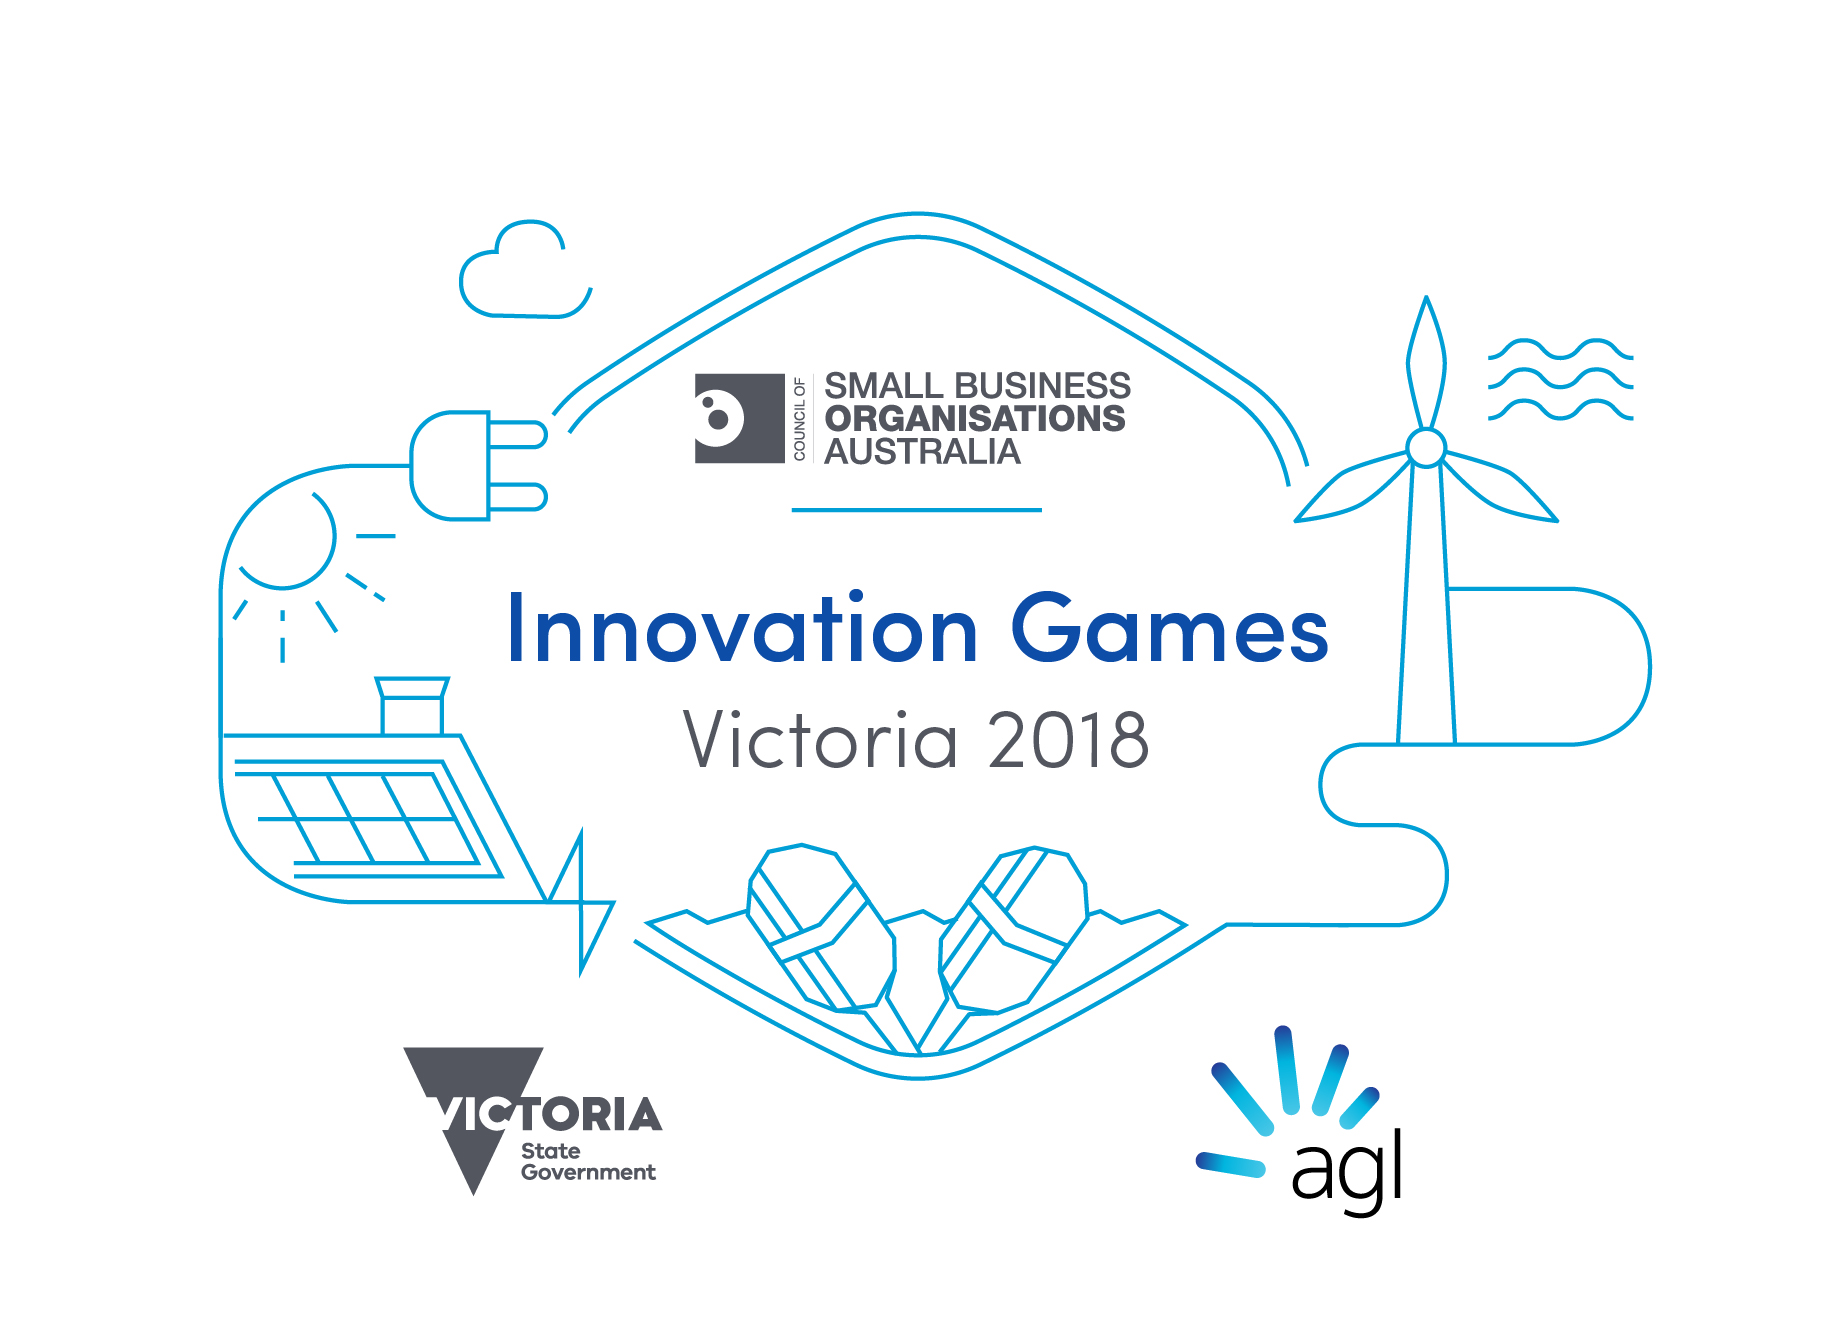 cosboa-innovation-games-paddl-agl-energy-victorian-government.jpg